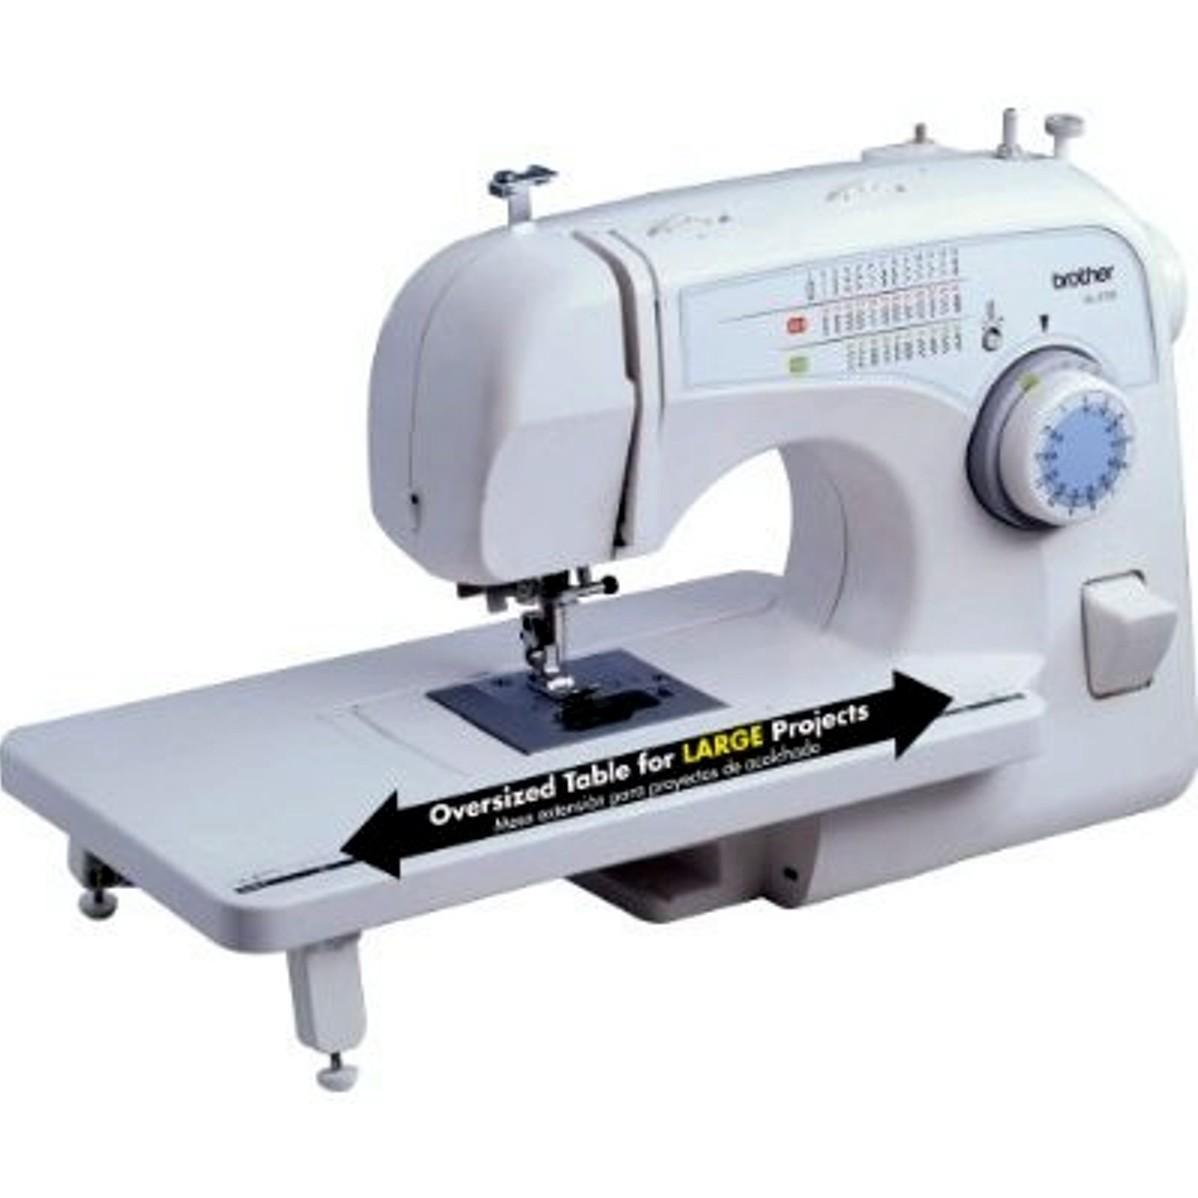 xl3750 convertible free arm sewing machine